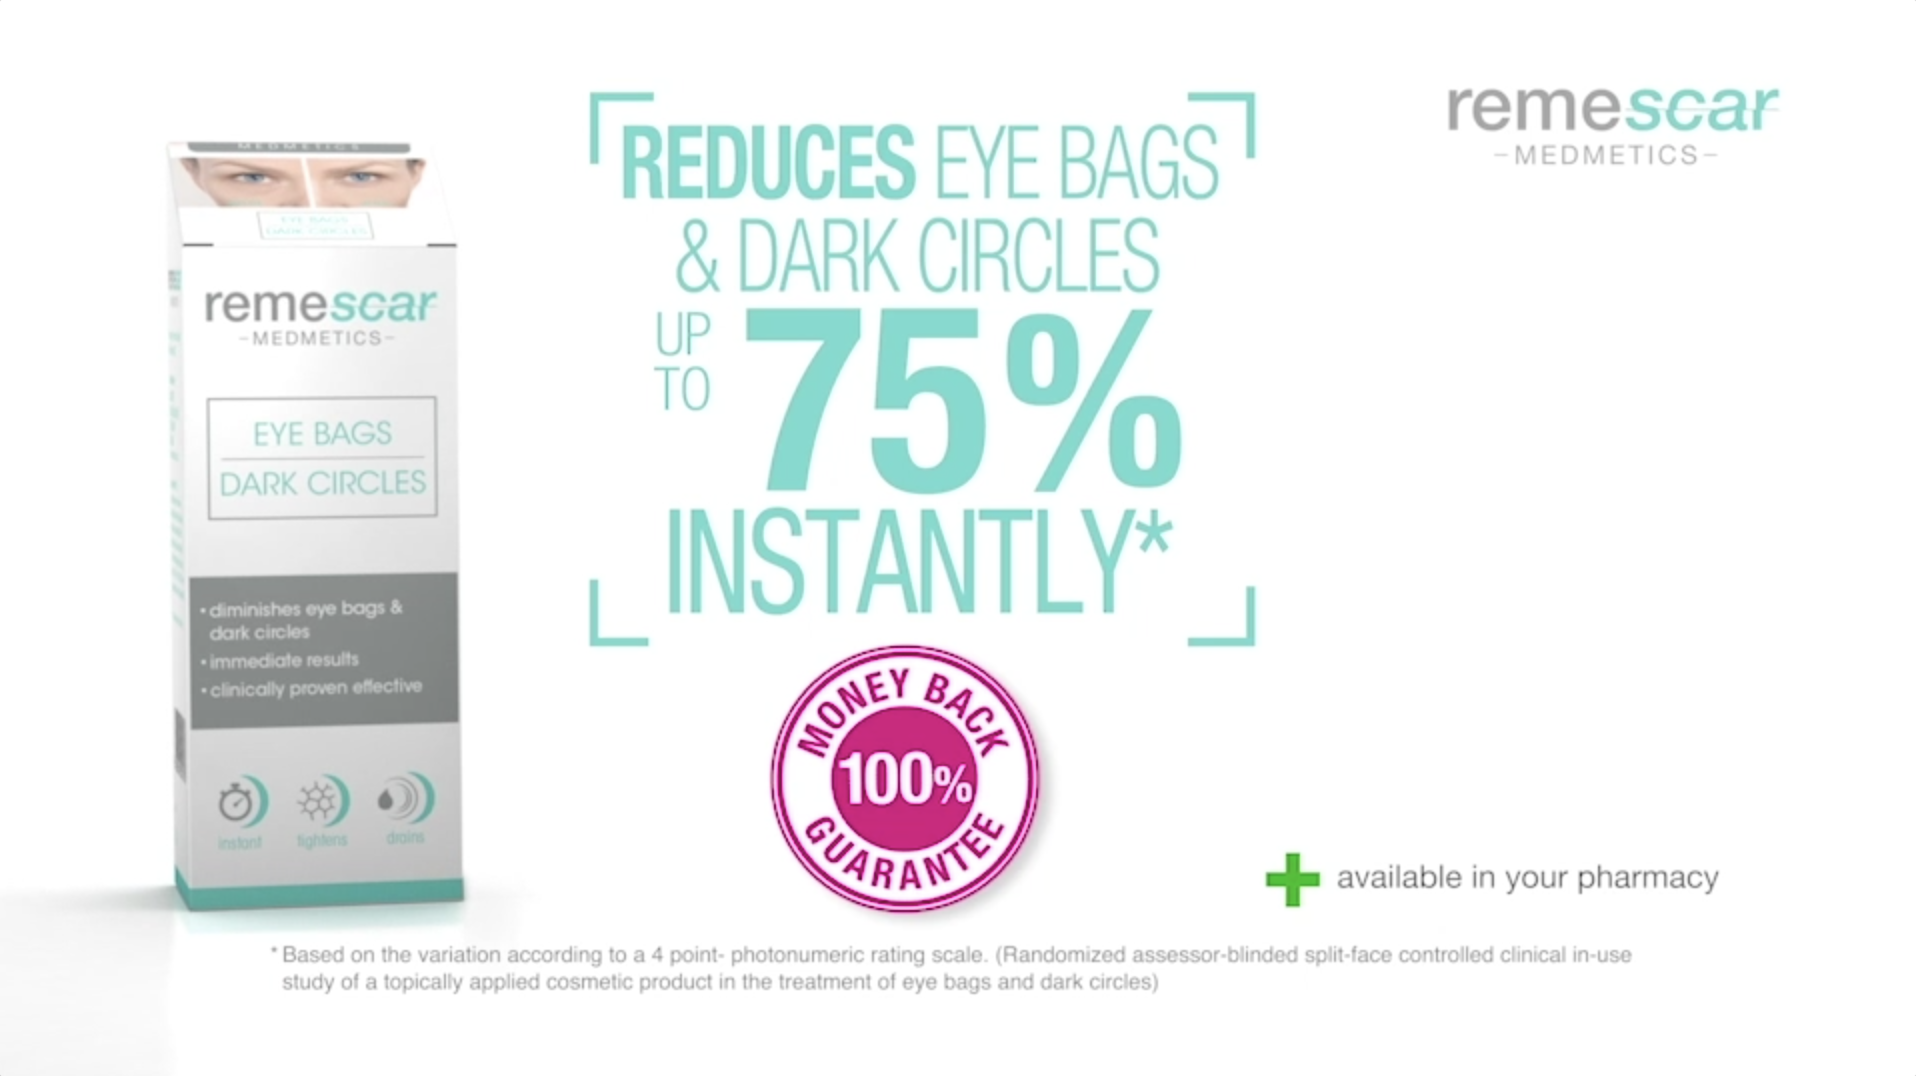 Remescar Eyebags 2